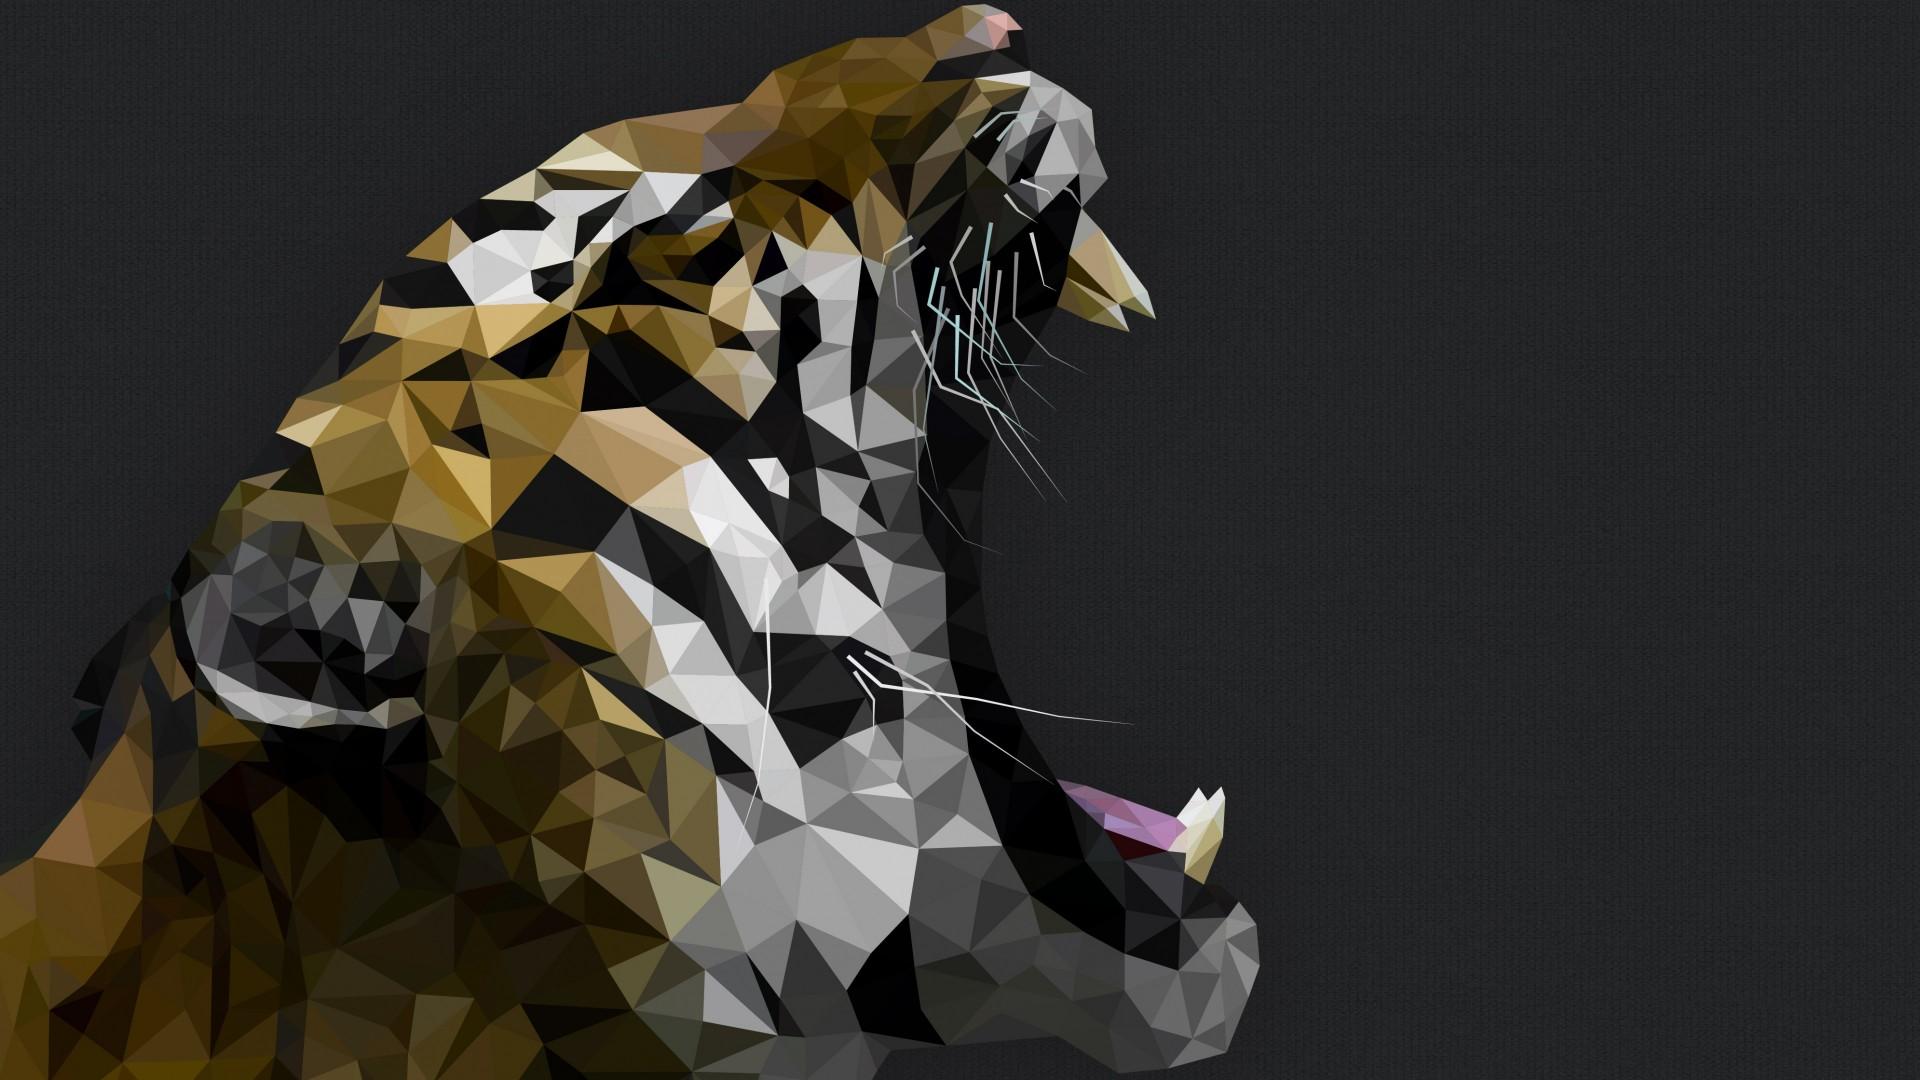 Wallpaper Tiger Polygon Roar Art Animals 5384 Page 19